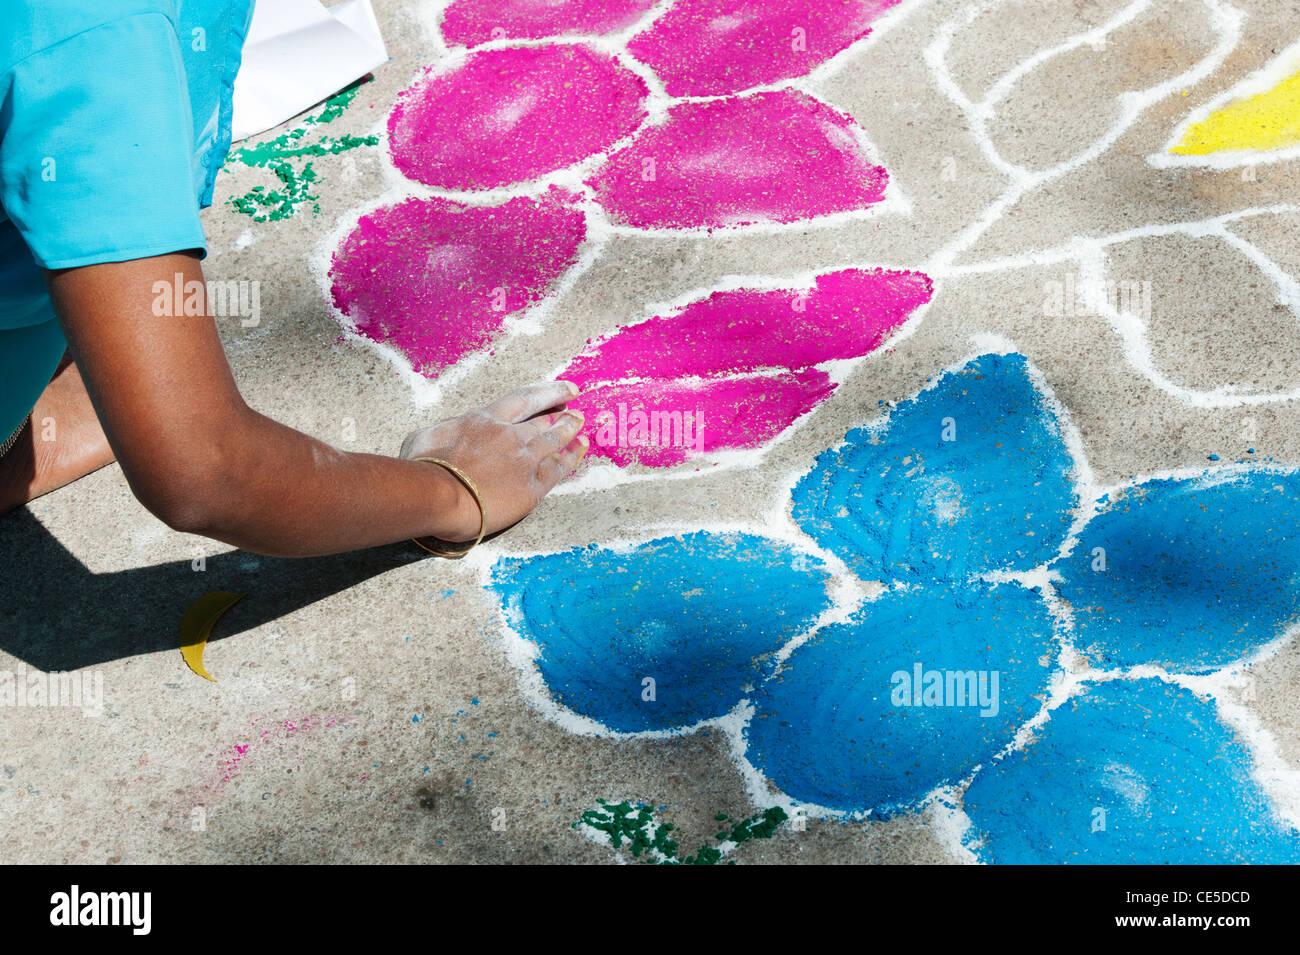 La India mujer haciendo un festival Rangoli coloured powder diseño en India Street. Puttaparthi, Andhra Pradesh, Imagen De Stock